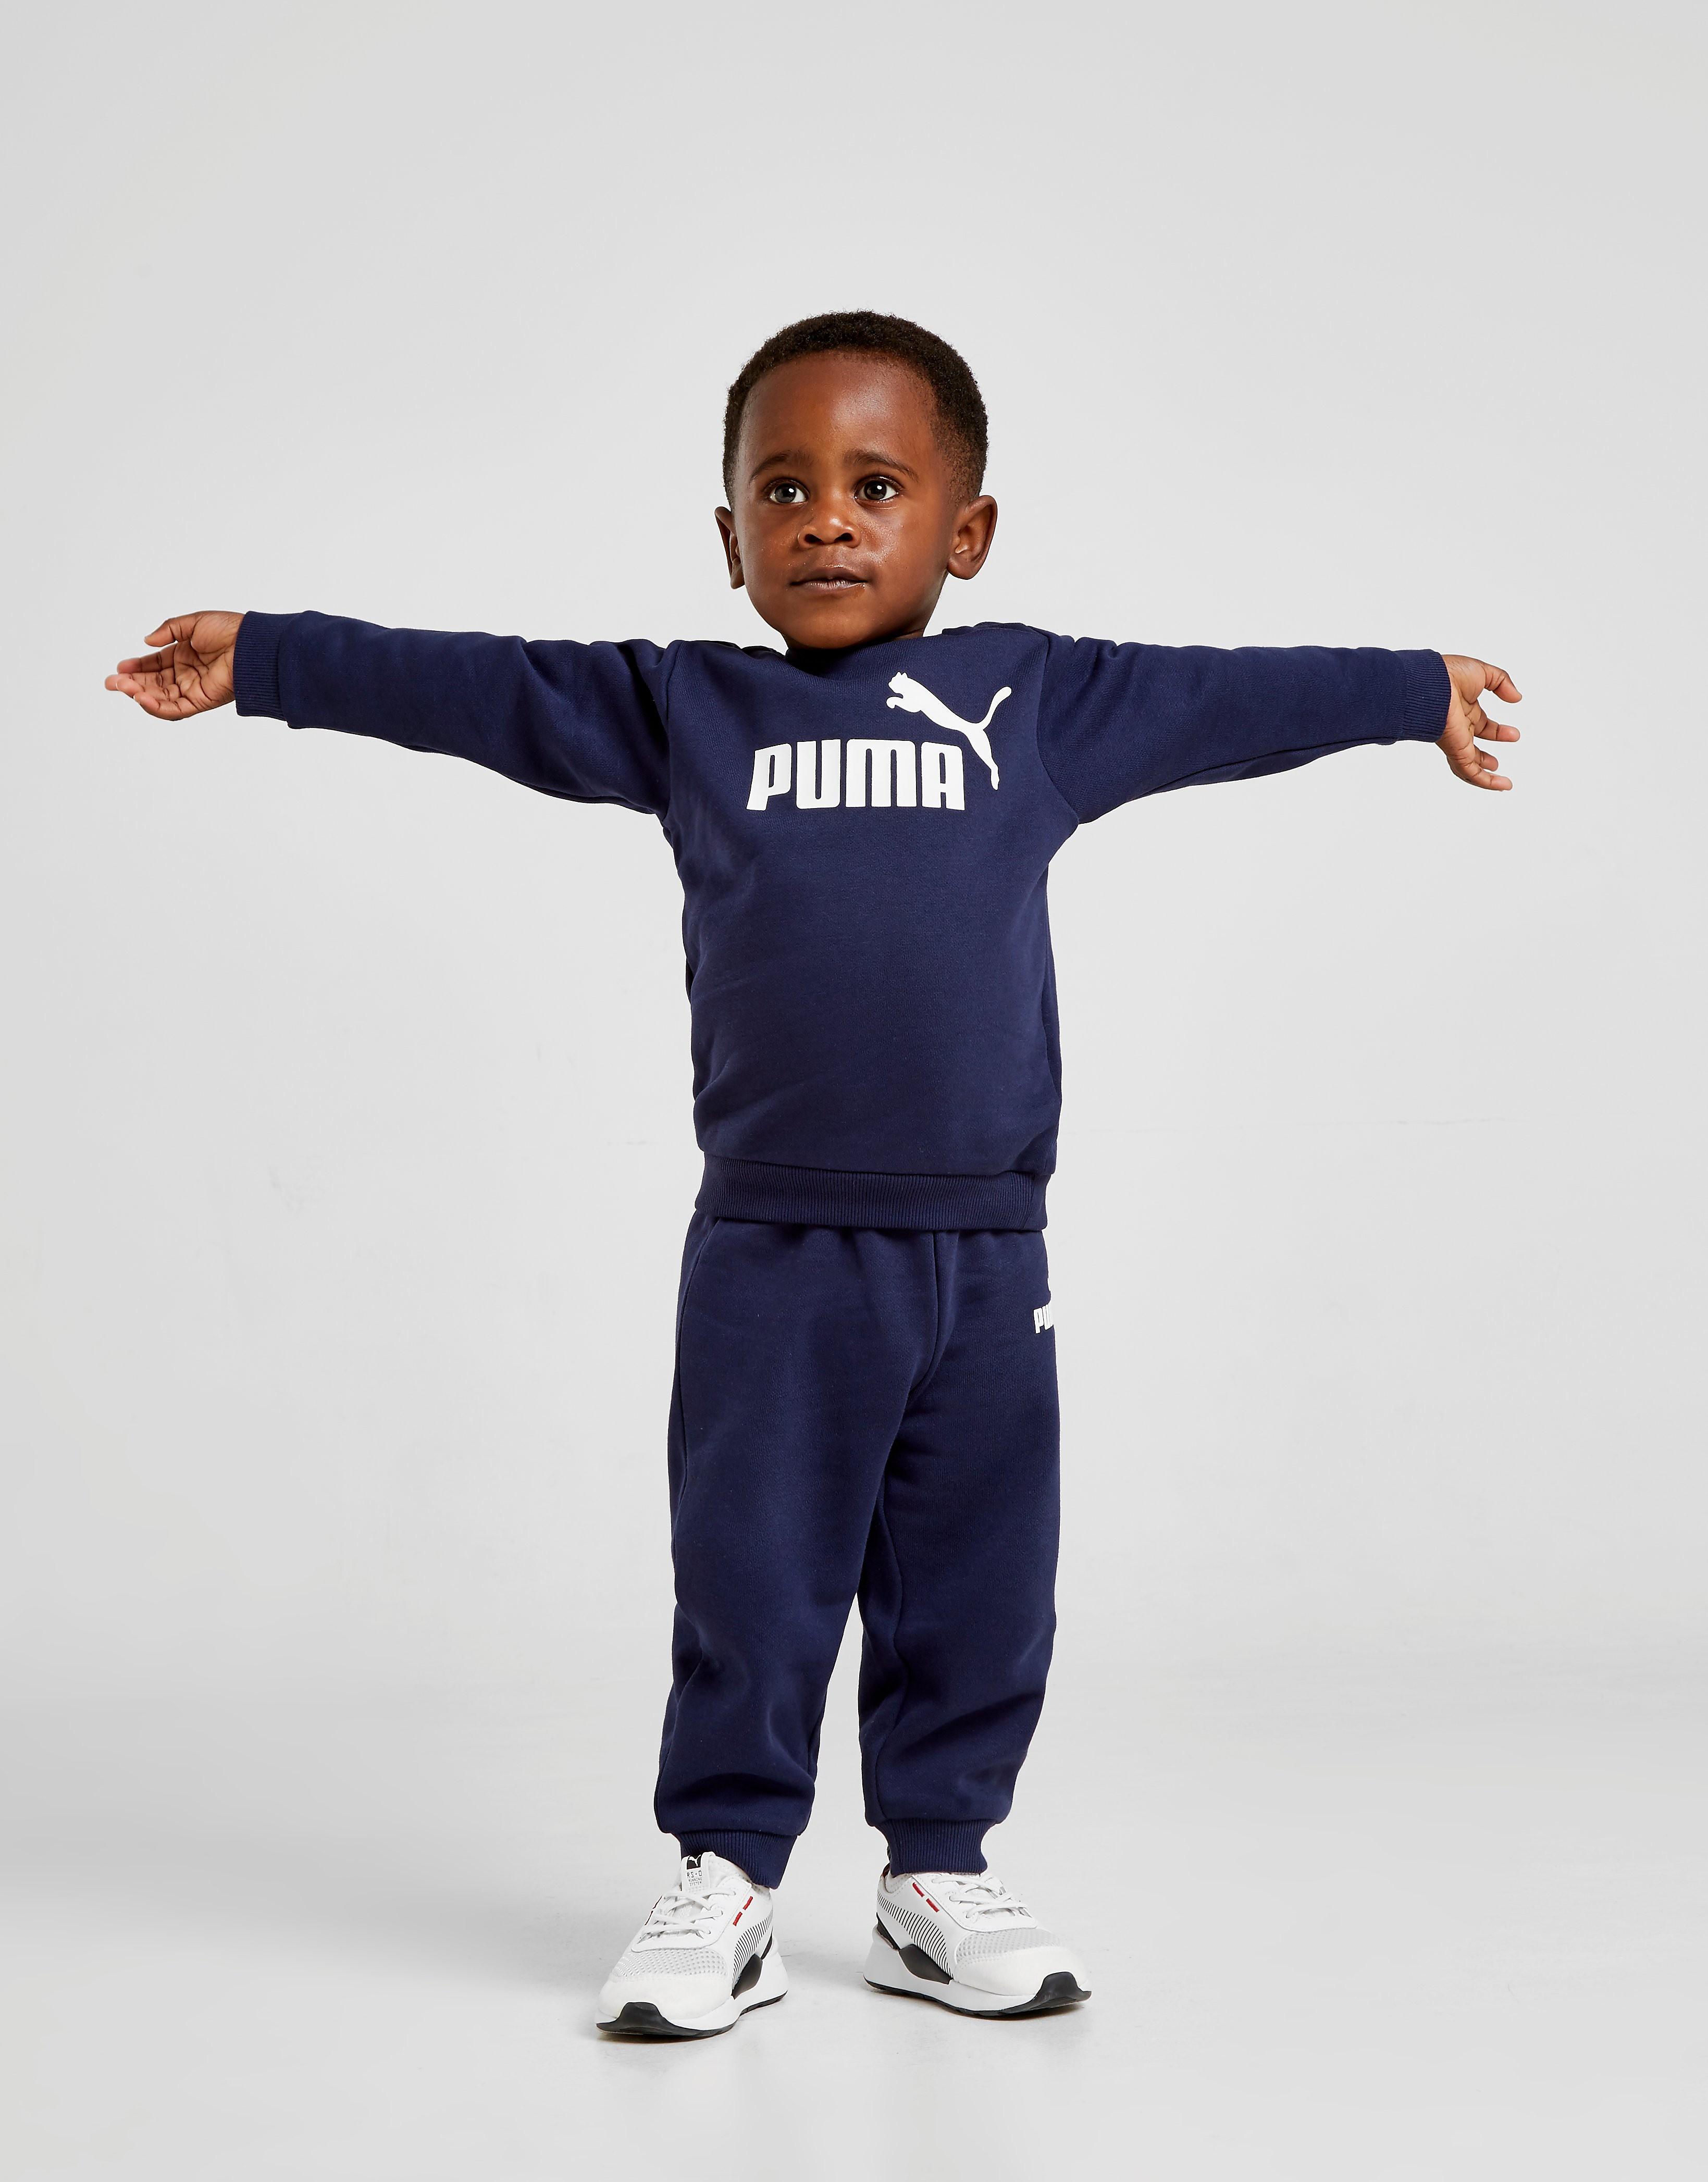 PUMA Logo Crew Trainingspak Baby's alleen bij JD Blauw Kind Blauw